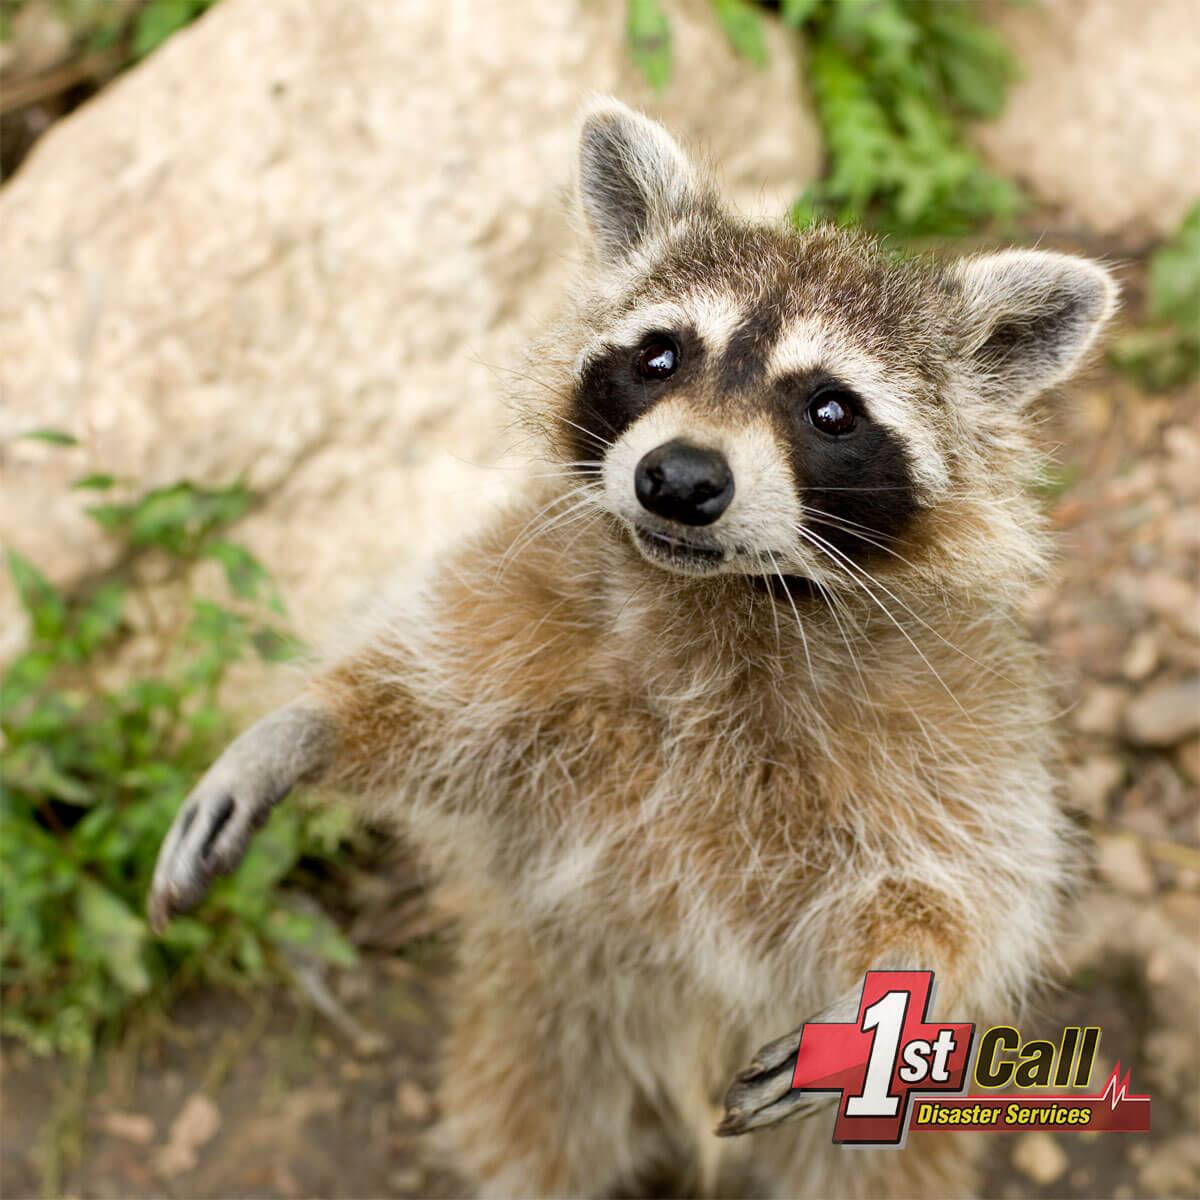 Raccoon Damage Cleanup in Bellevue, KY